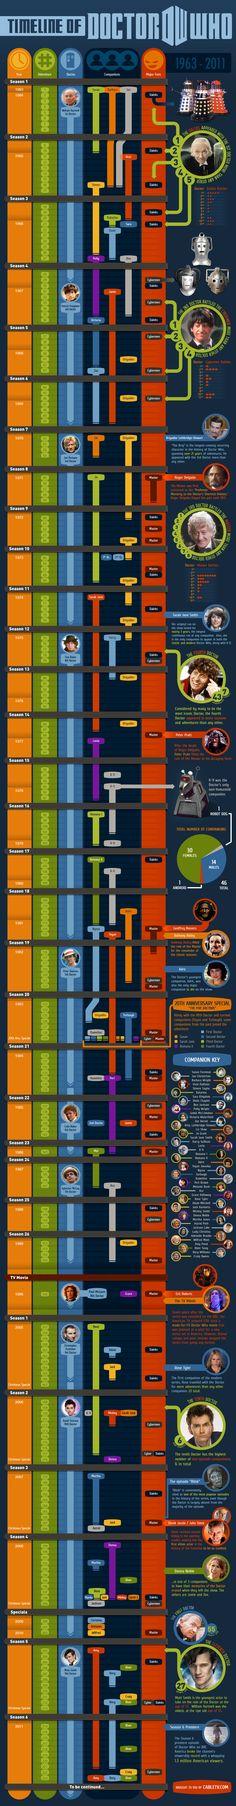 Doctor Who InfoChart